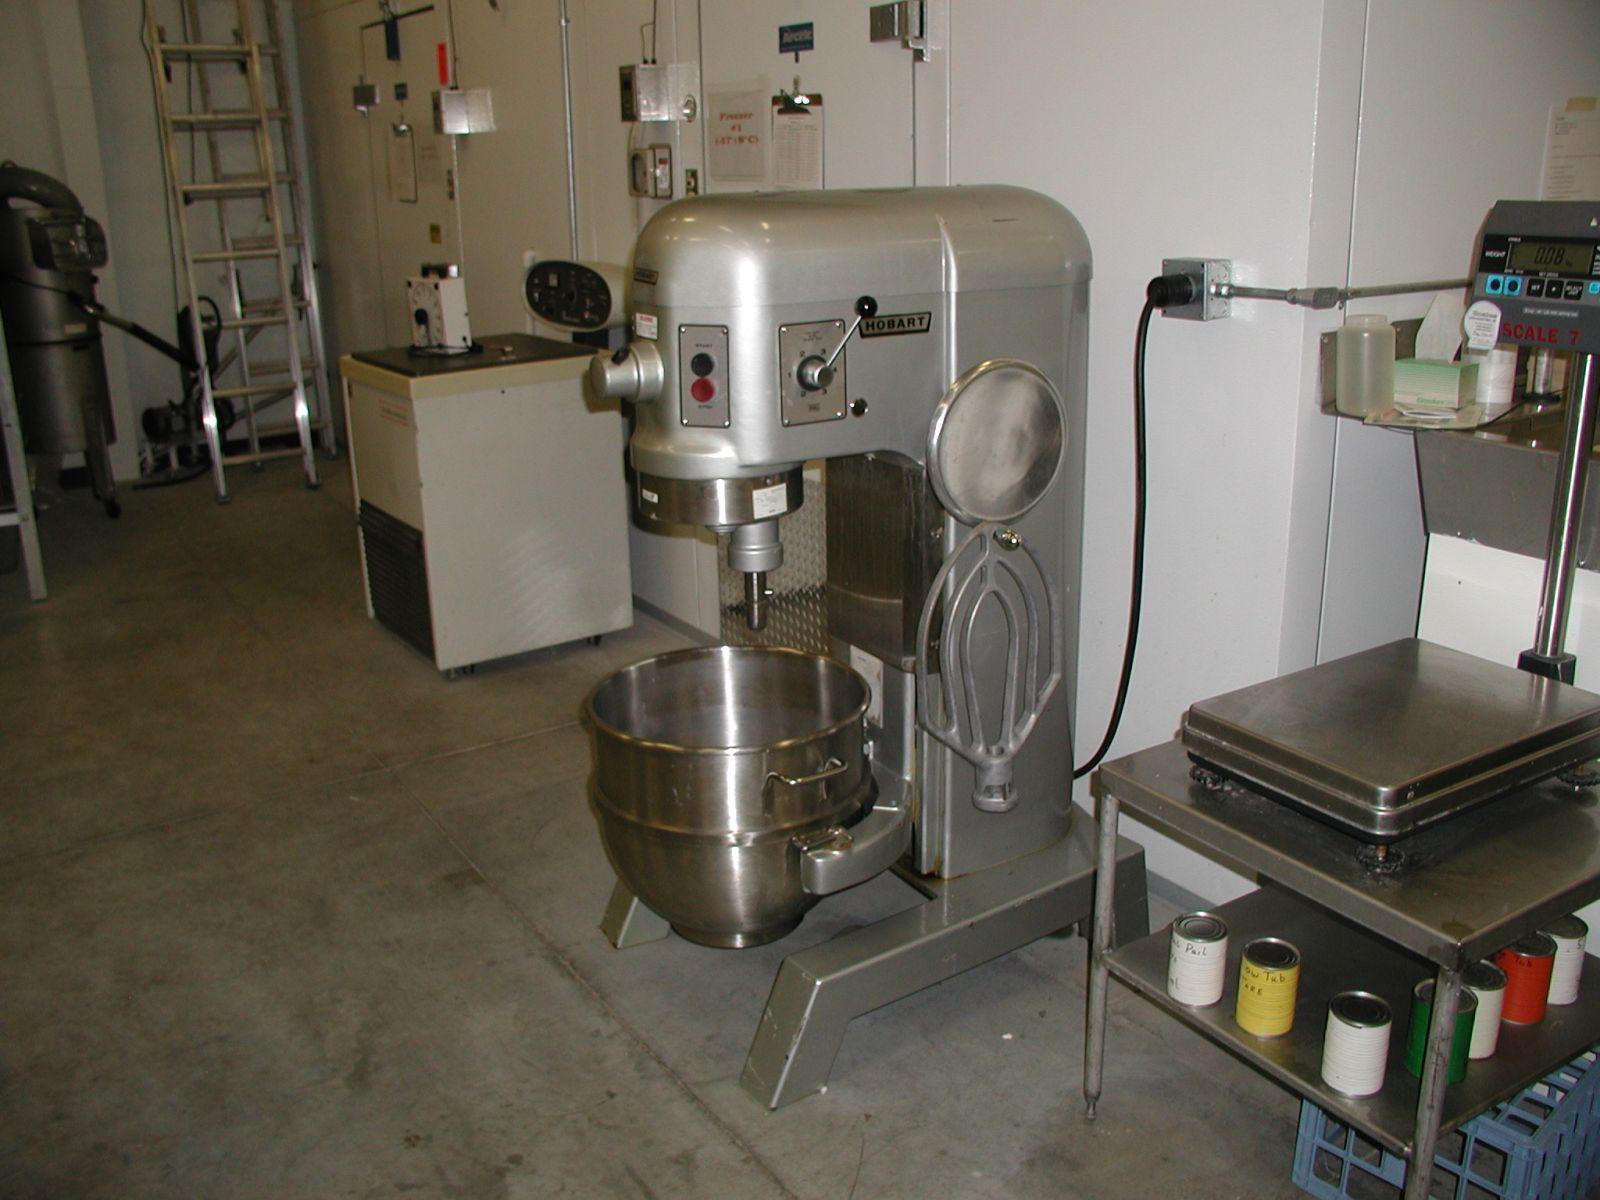 Hobart Kitchen Equipment Review   ifood.